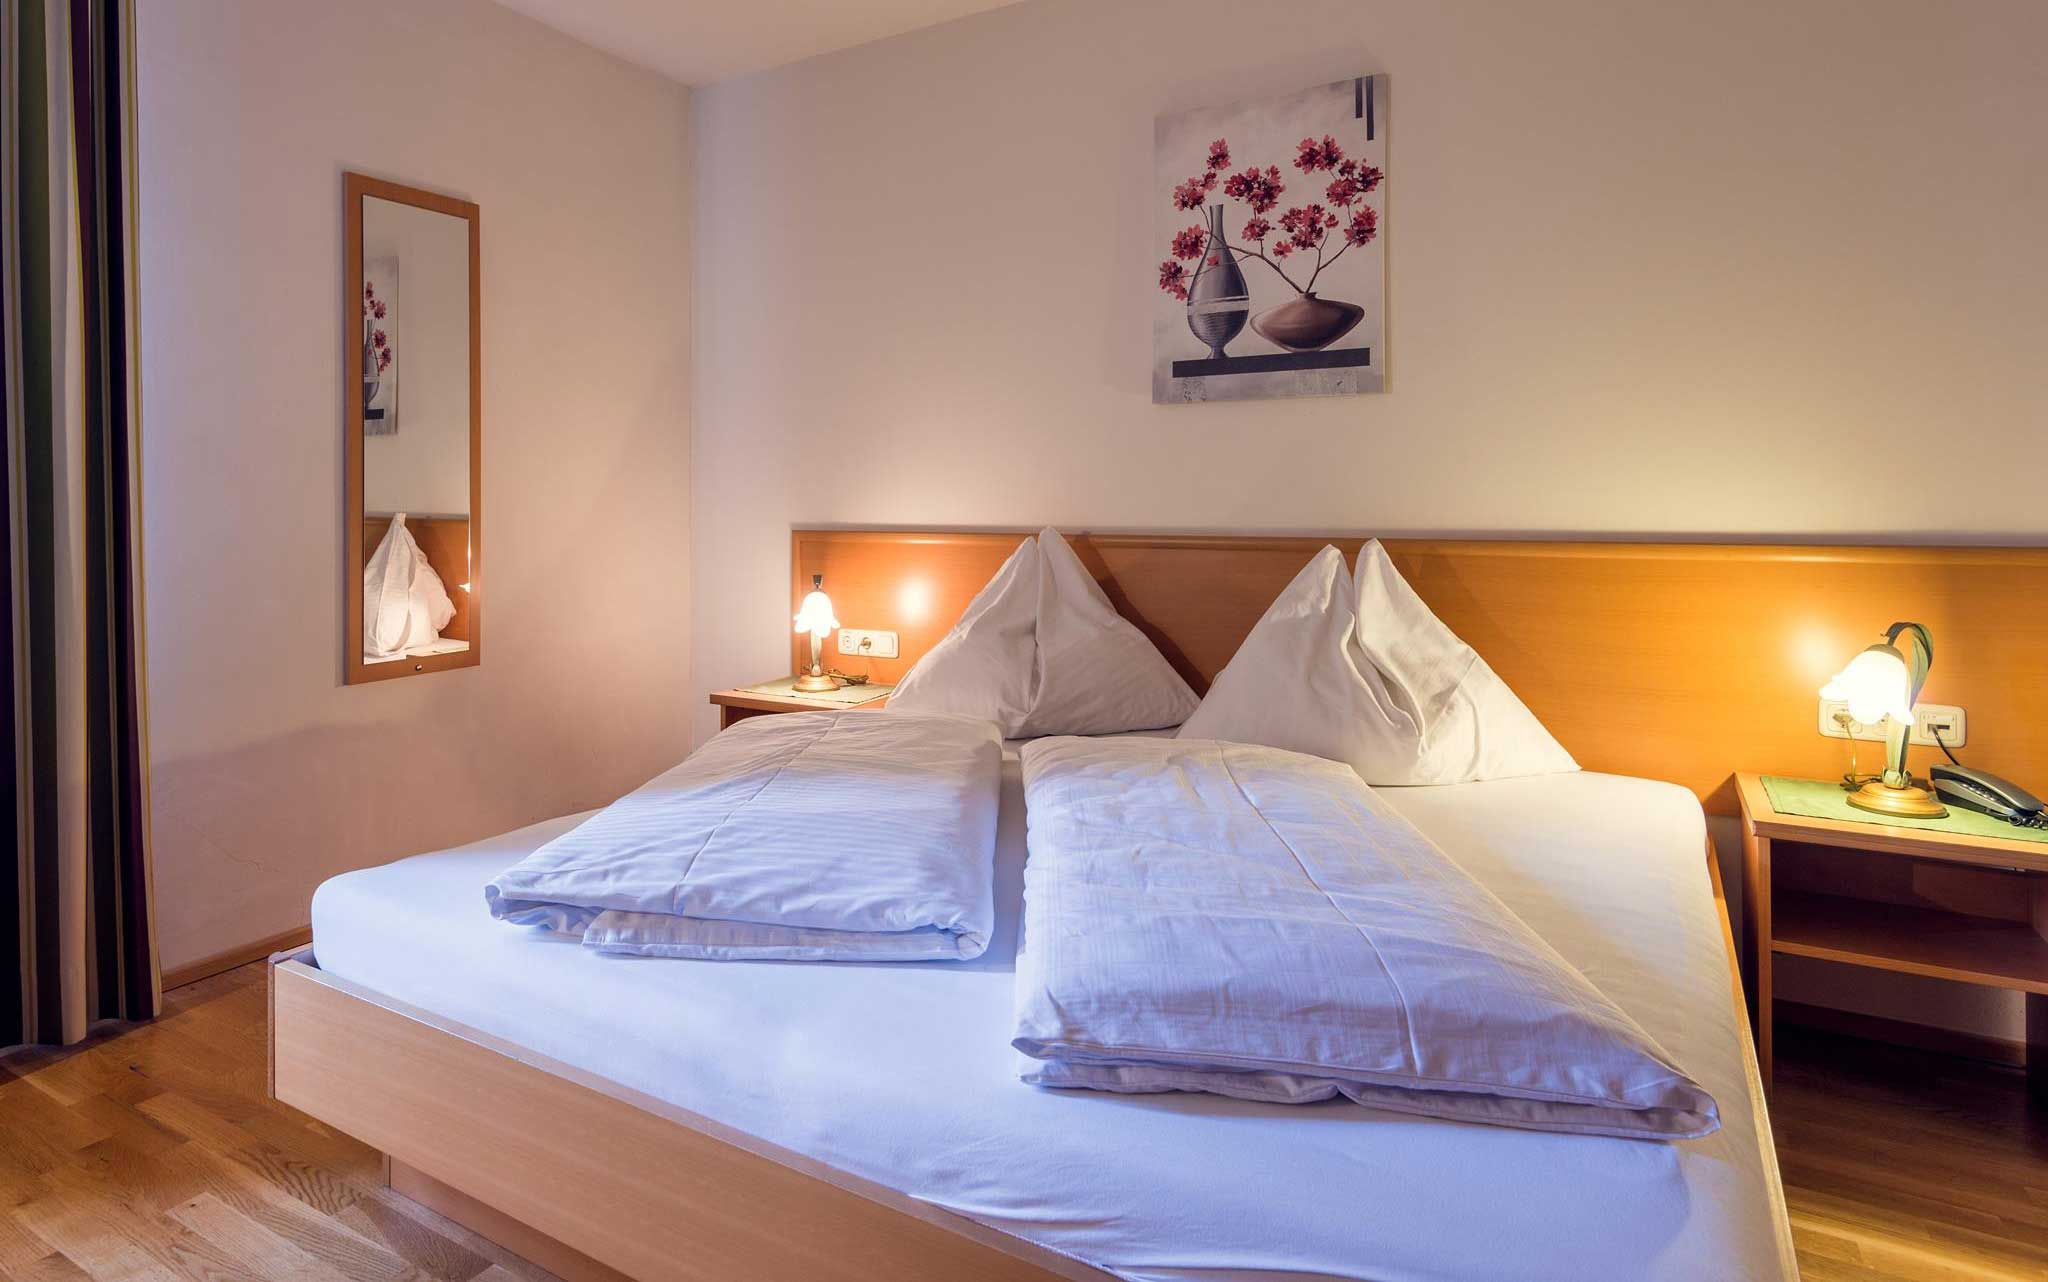 Doppelzimmer im Hotel Stoecklwirt St. Johann Alpendorf